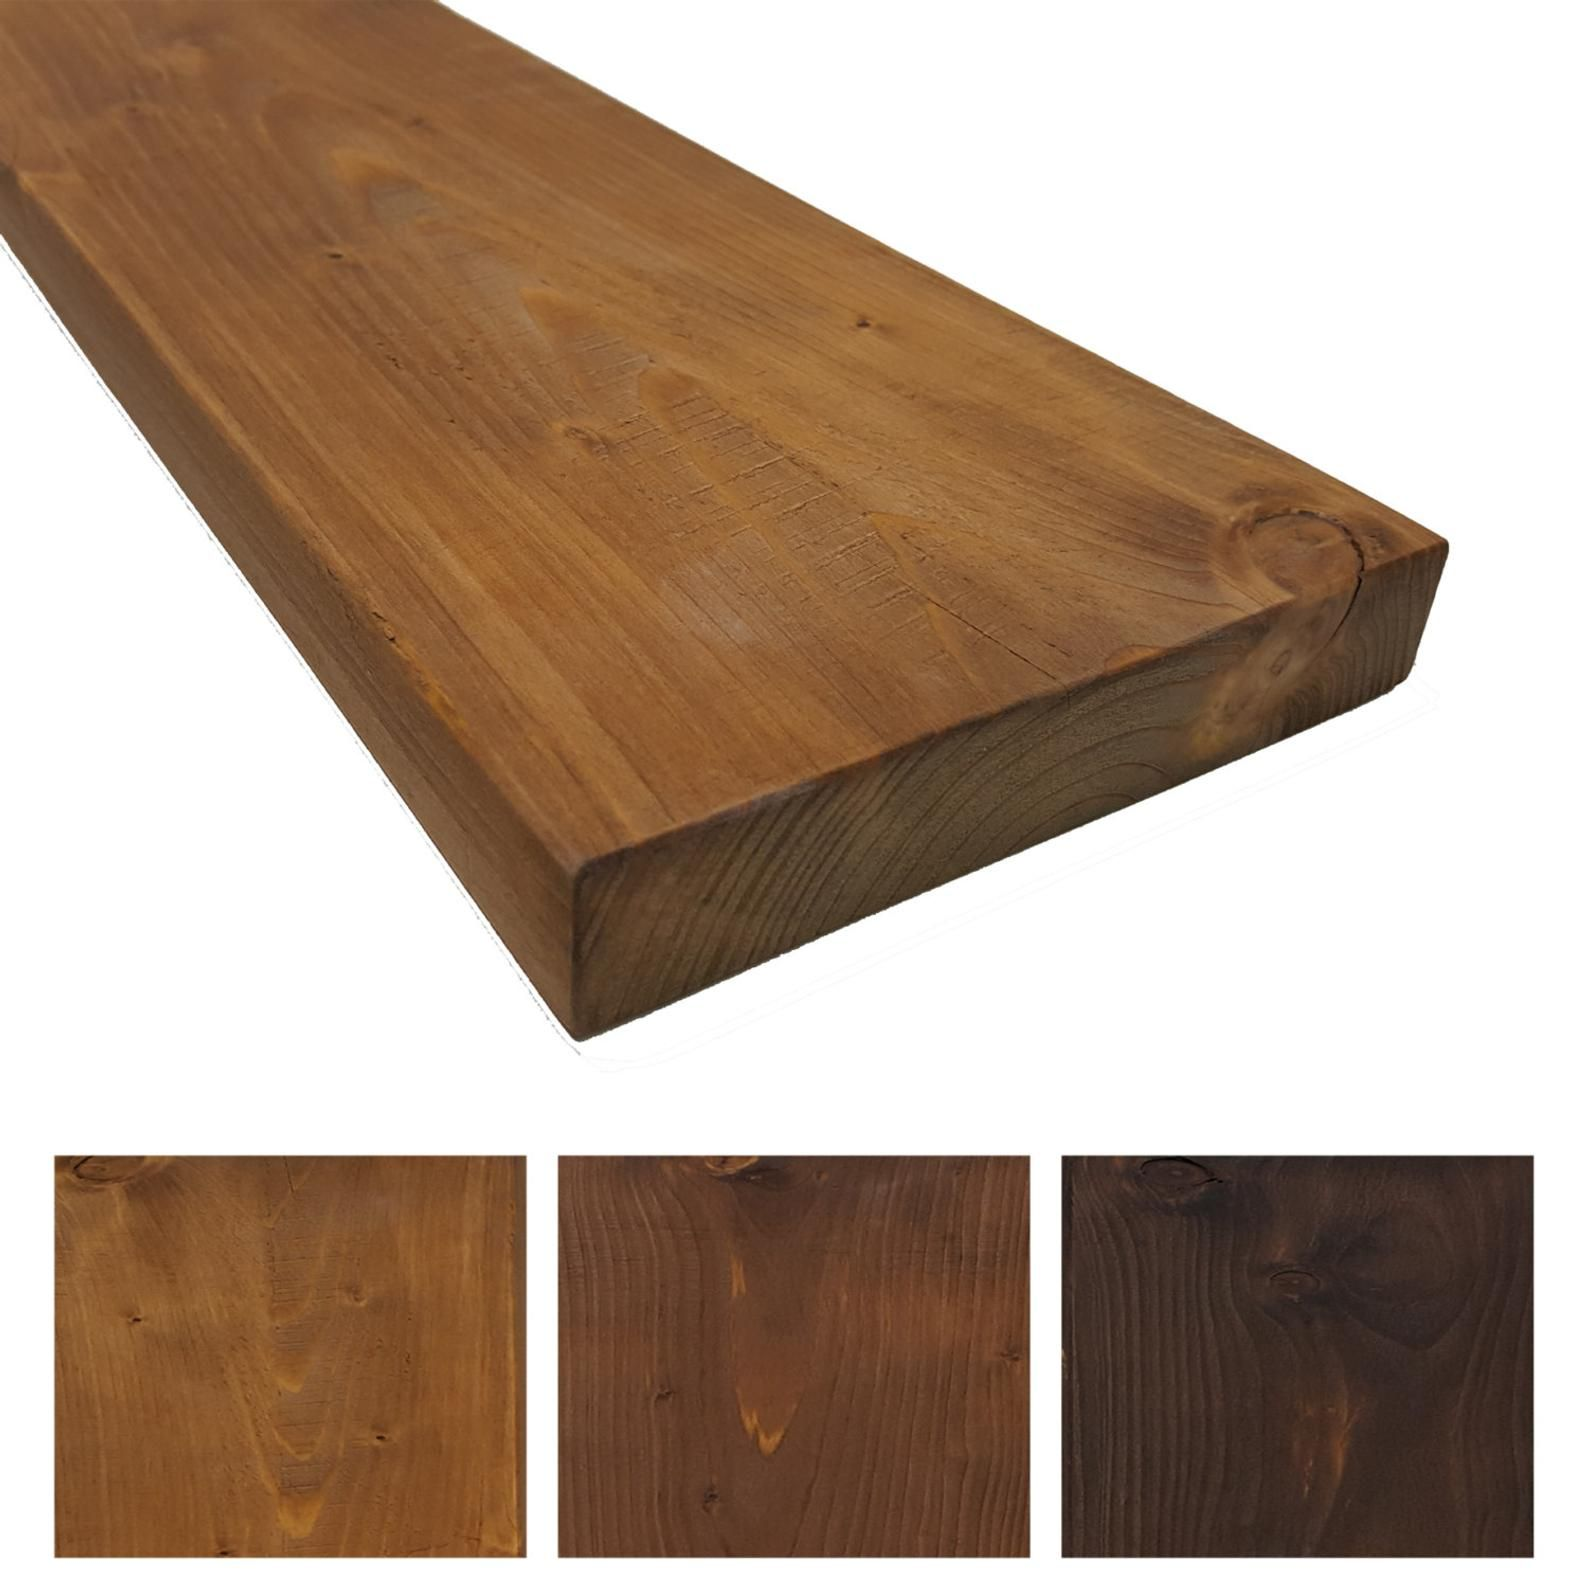 Rustikales Massivholz Wandregal 19cm Tief 35cm Stark Etsy Wood Wall Shelf Wood Wood Wall